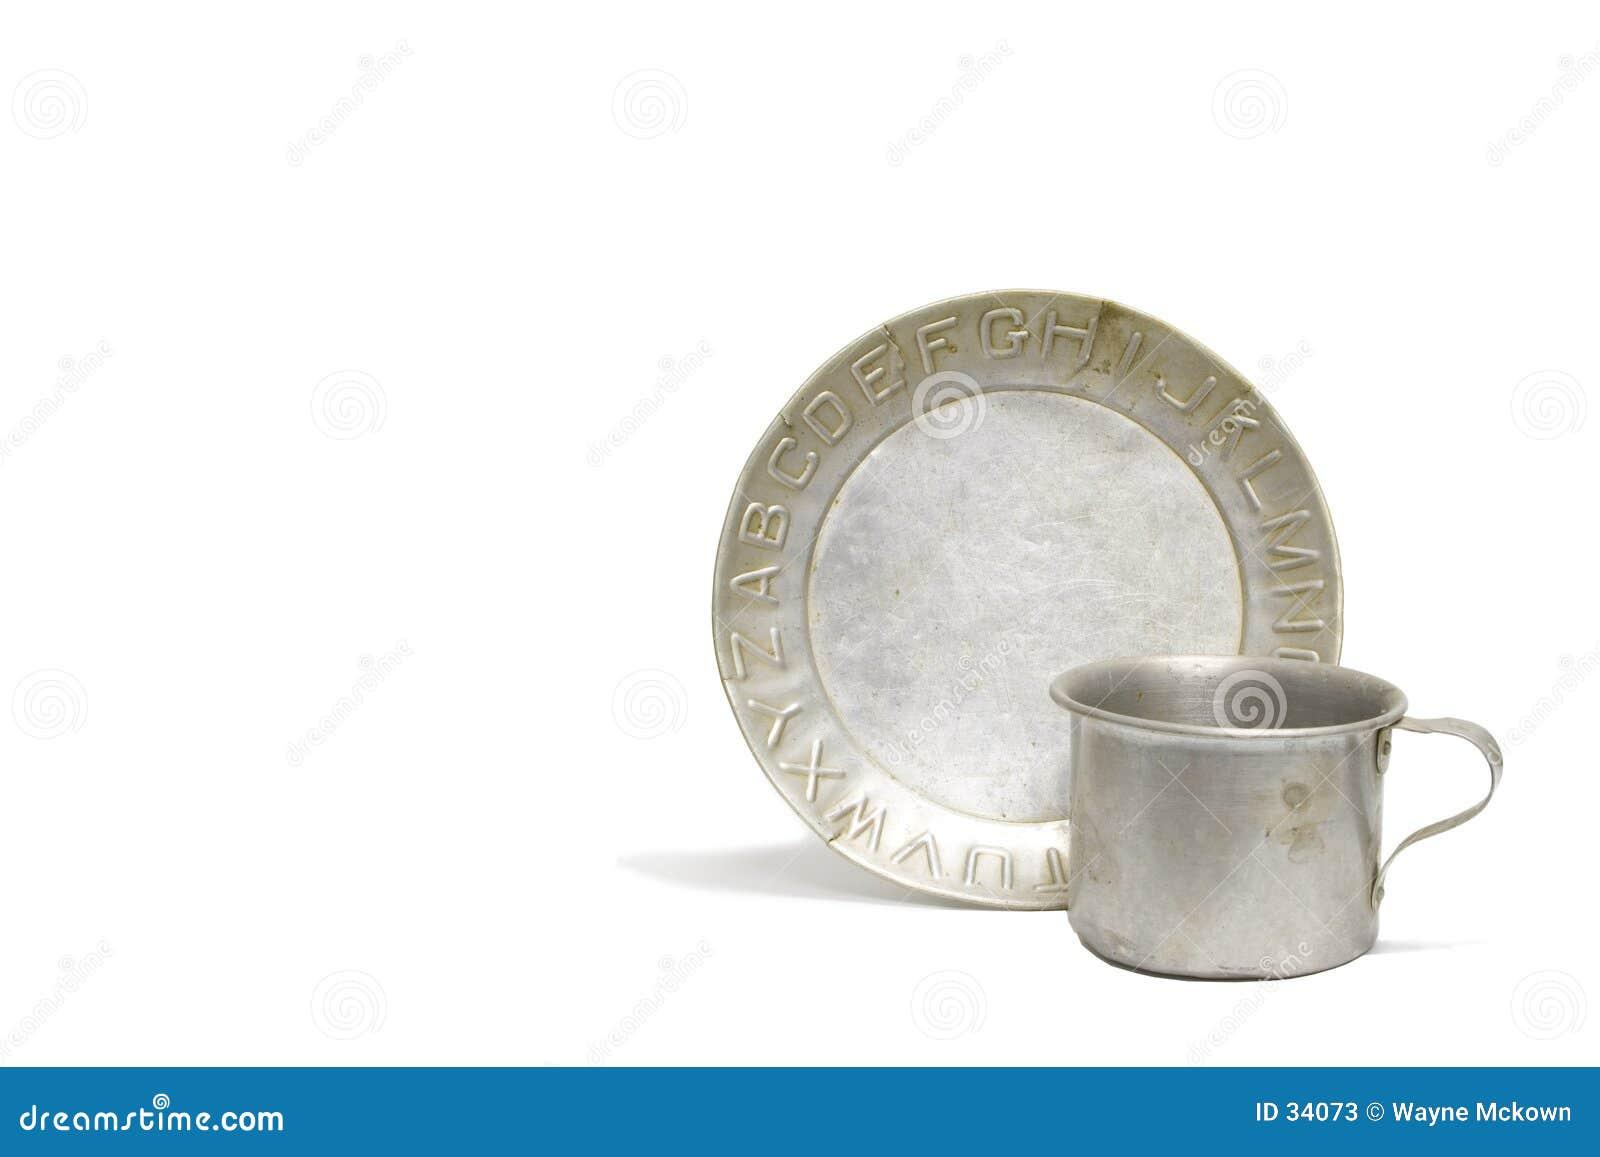 Alphabet plate & cup